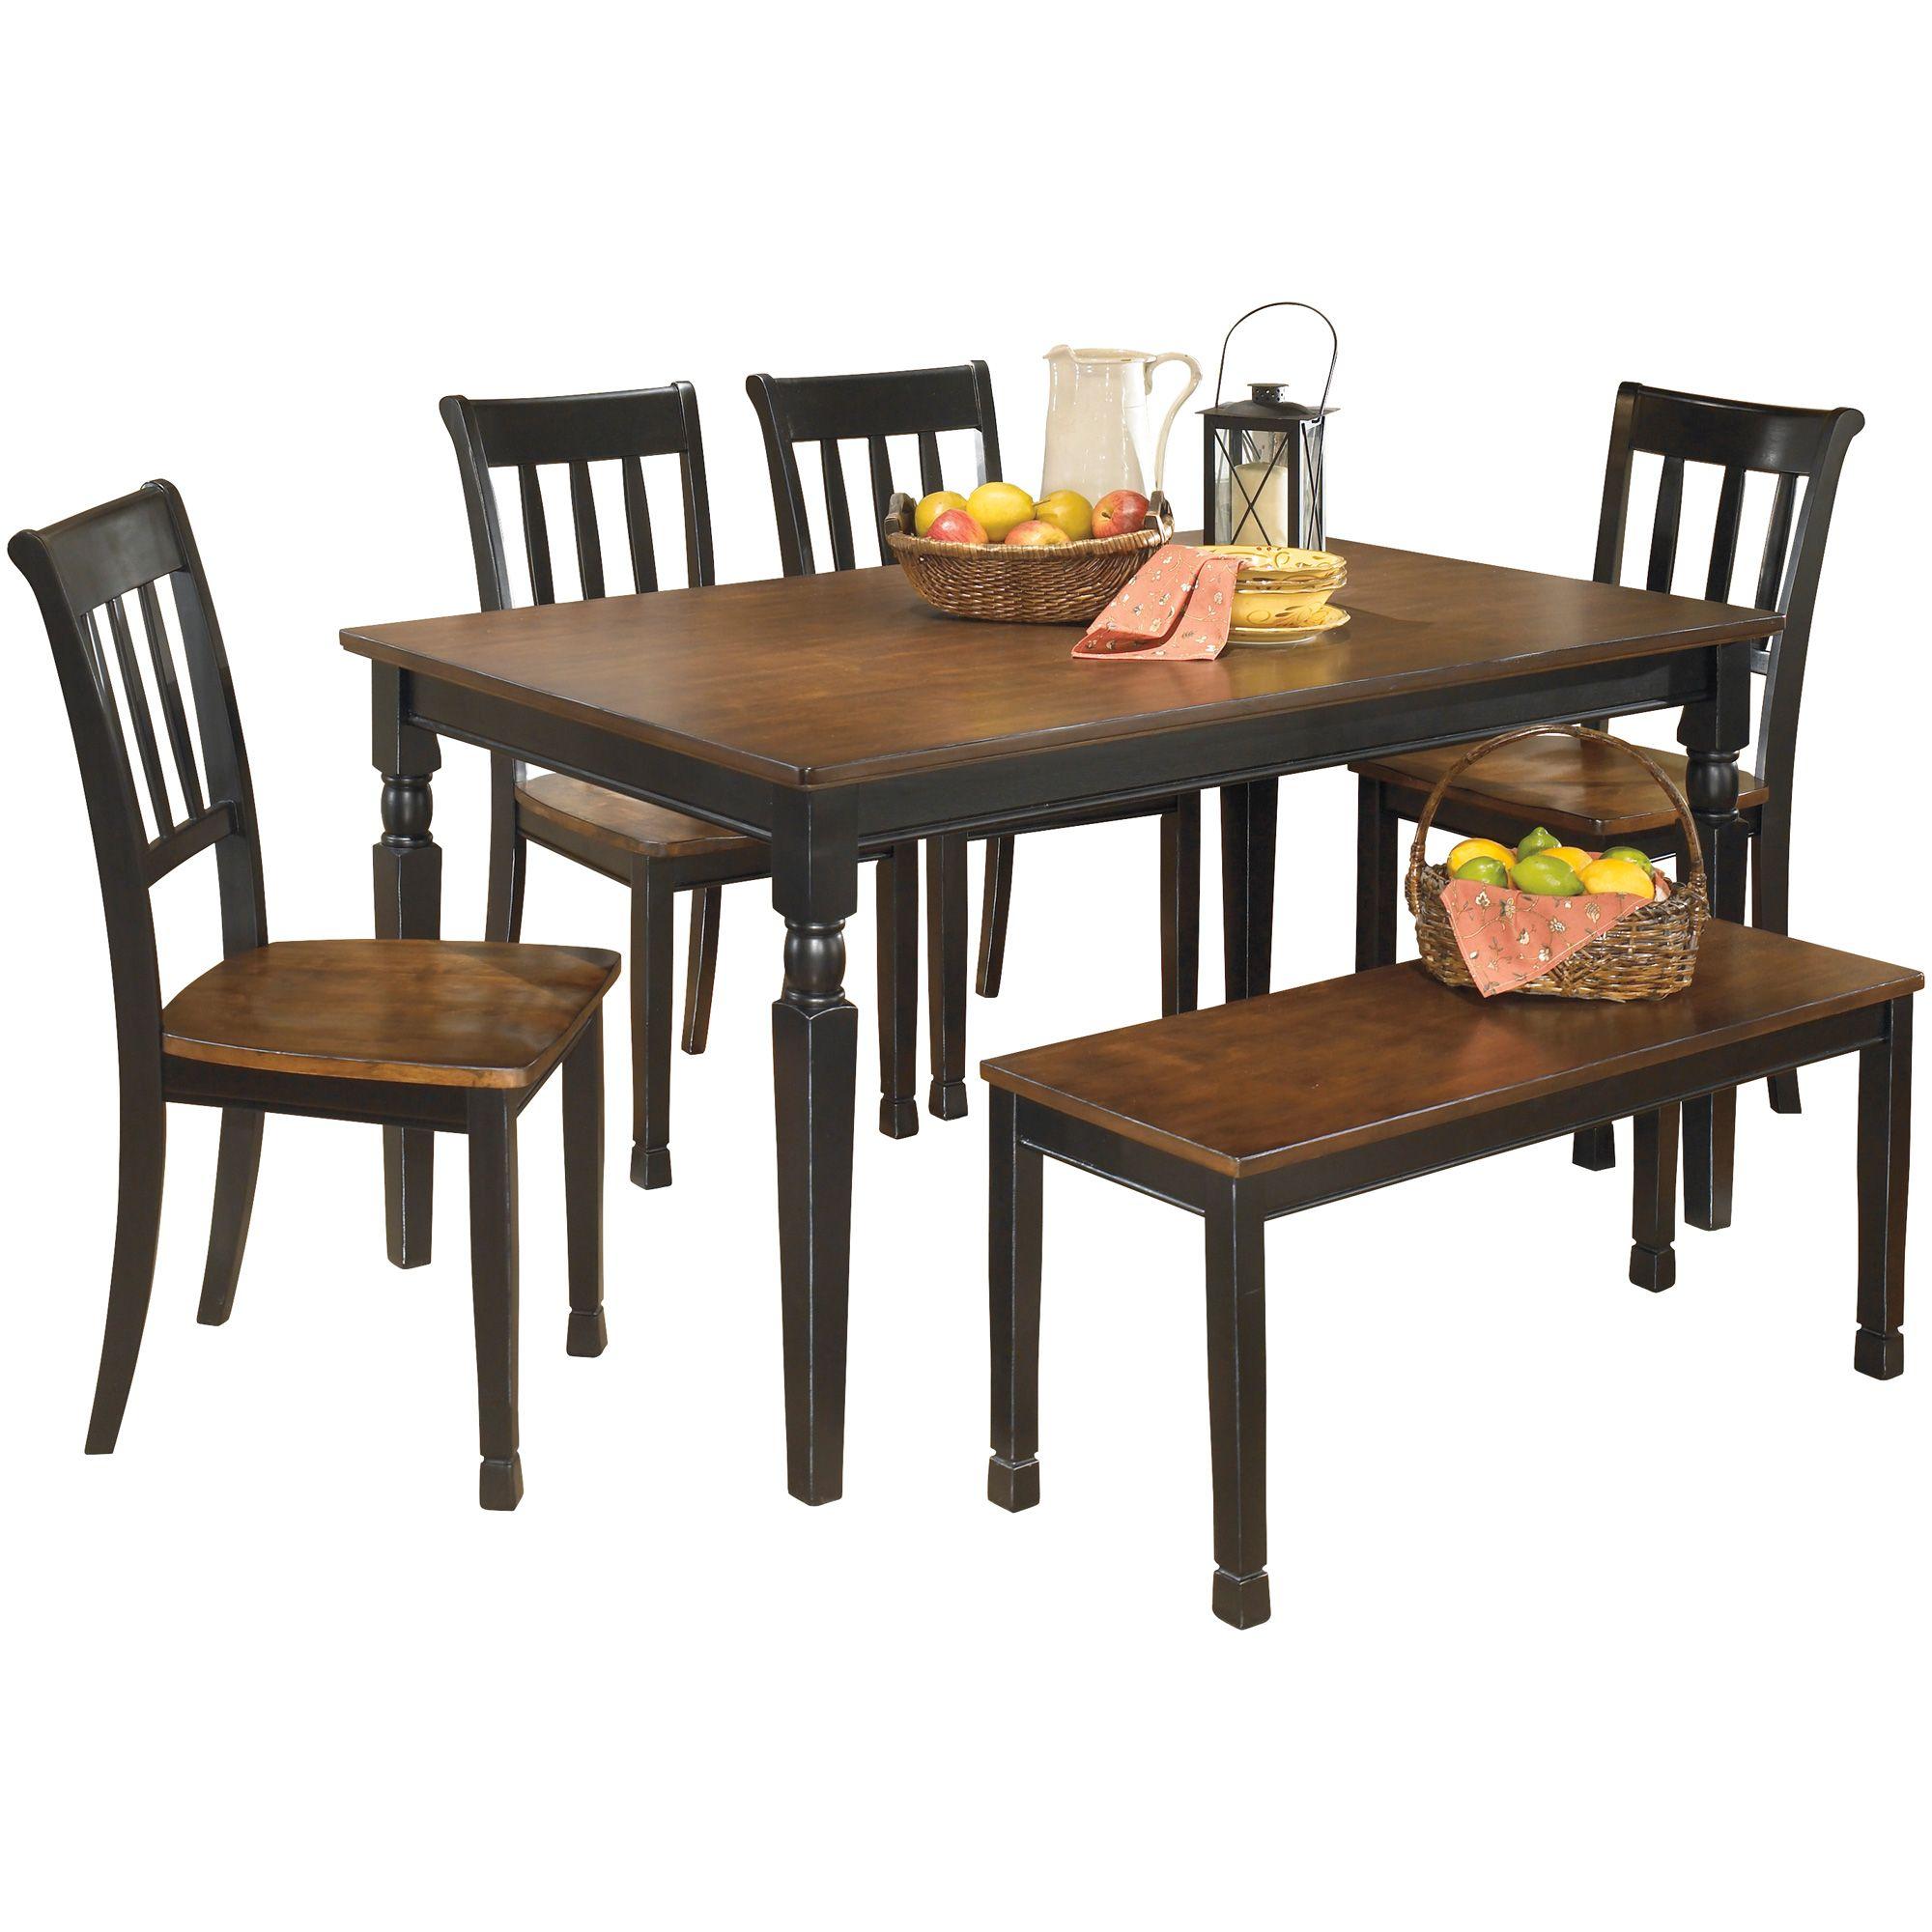 Ortonville Black Dining Set Black Dining Set Dining Room Sets Rectangular Dining Room Table